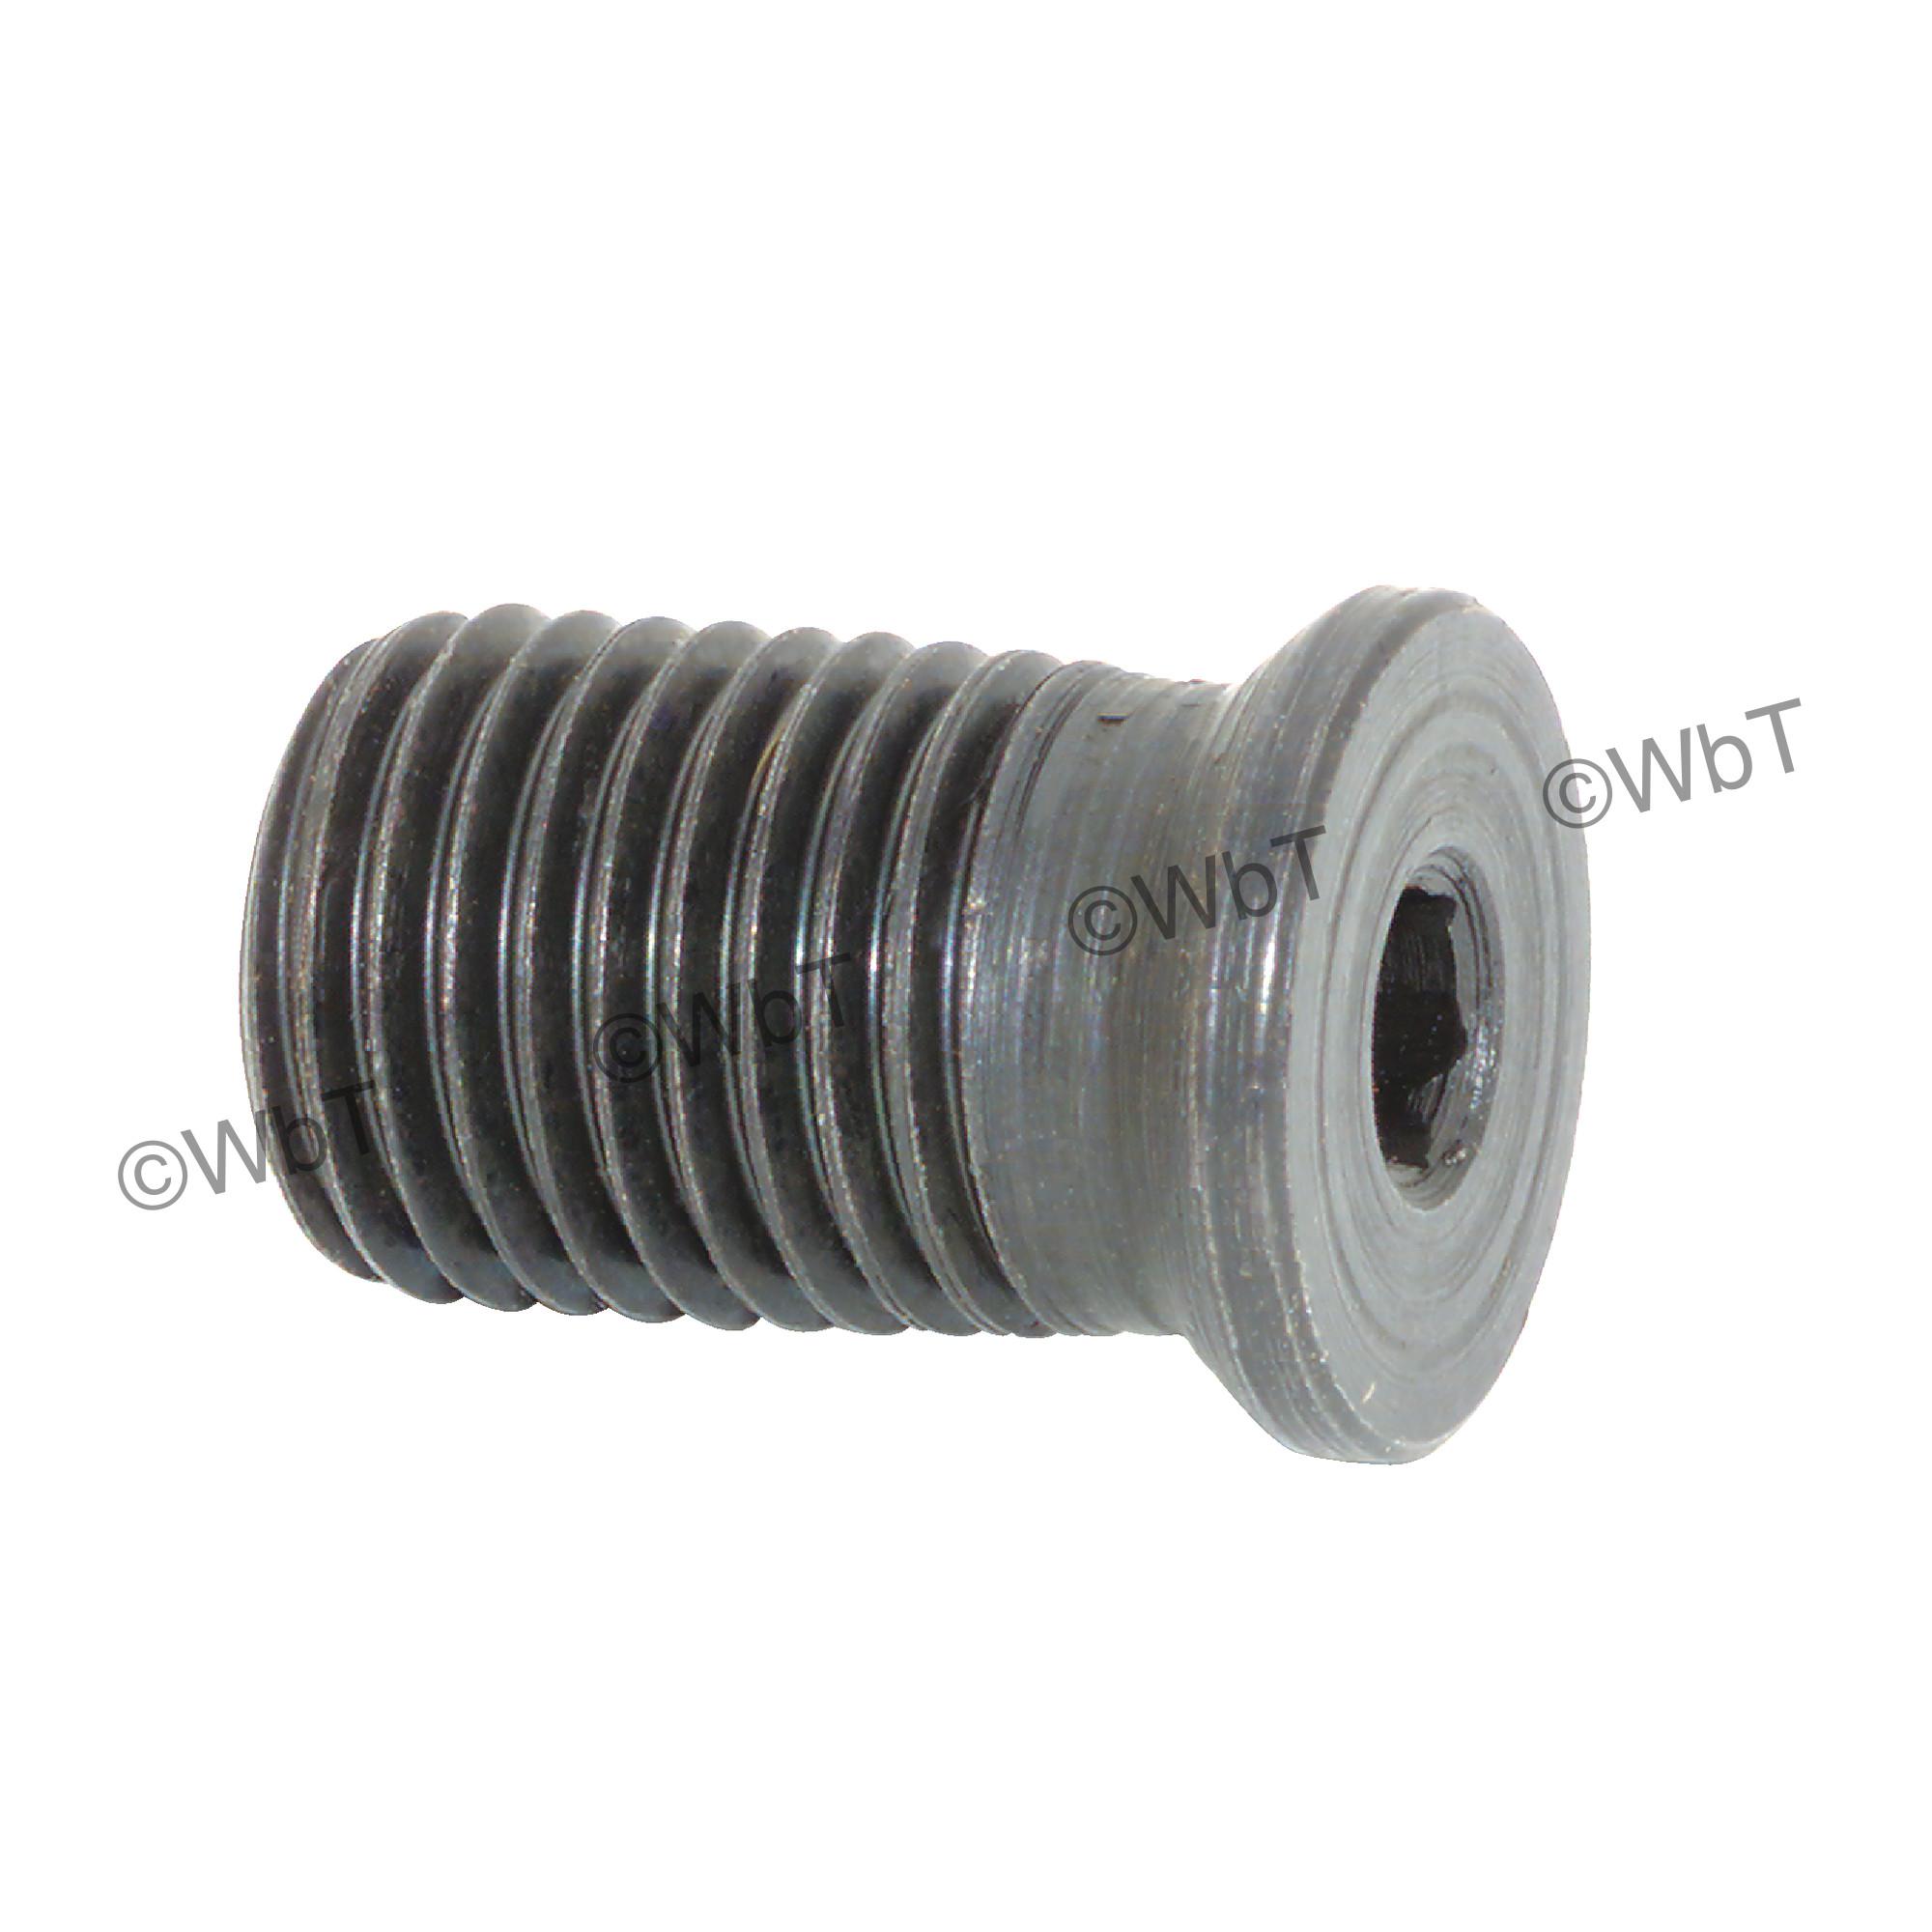 TTC PRODUCTION - S-34 Shim Screw